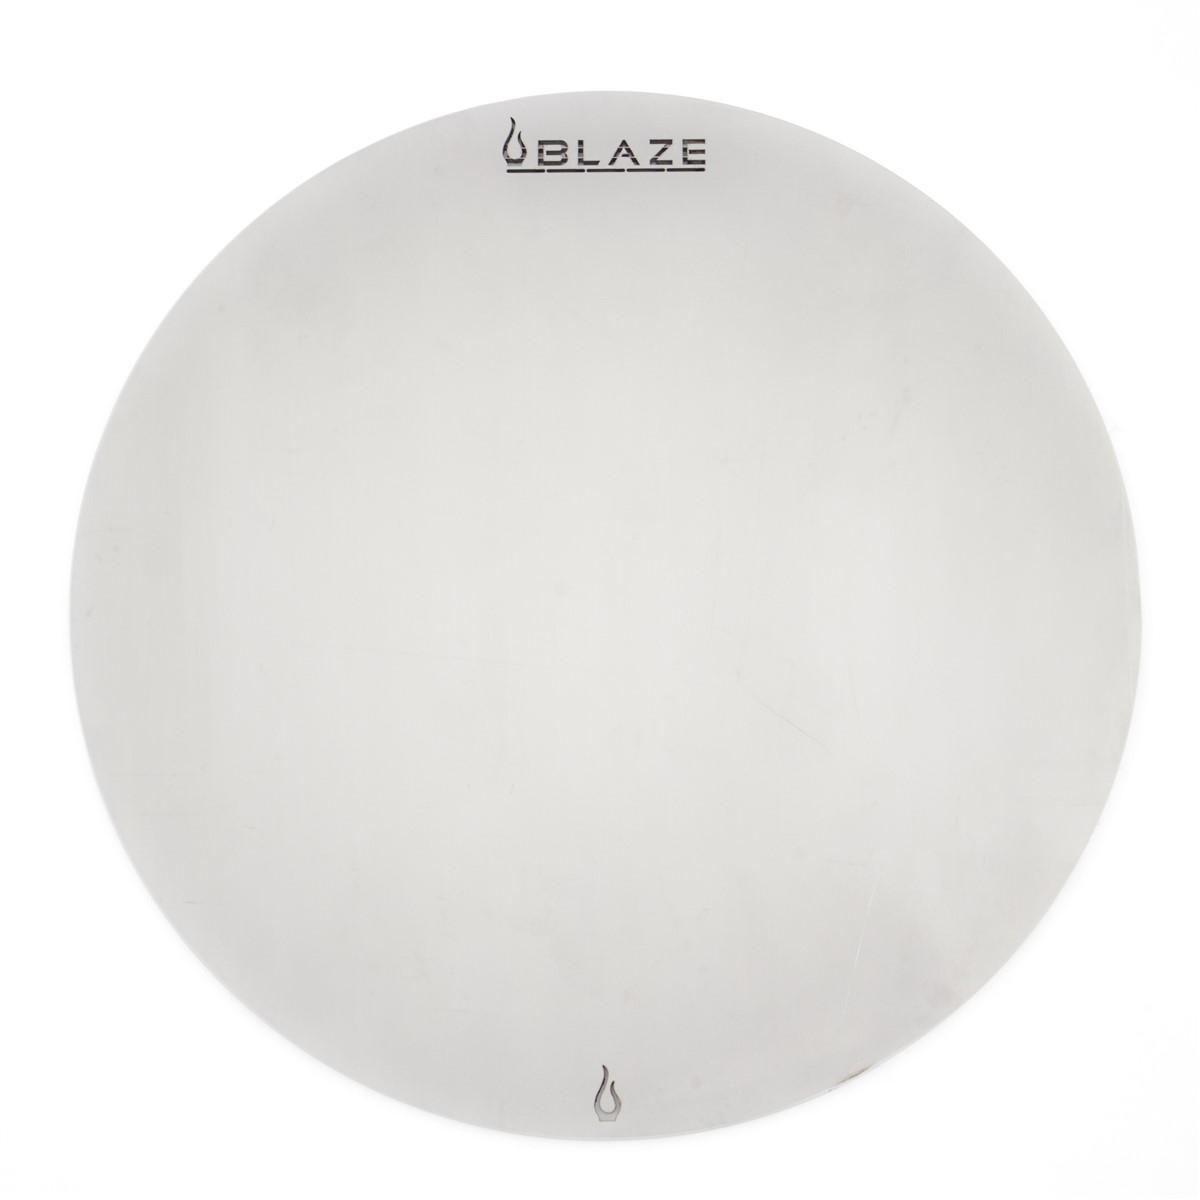 Blaze Kamado 4 in 1 plate (38 cm)